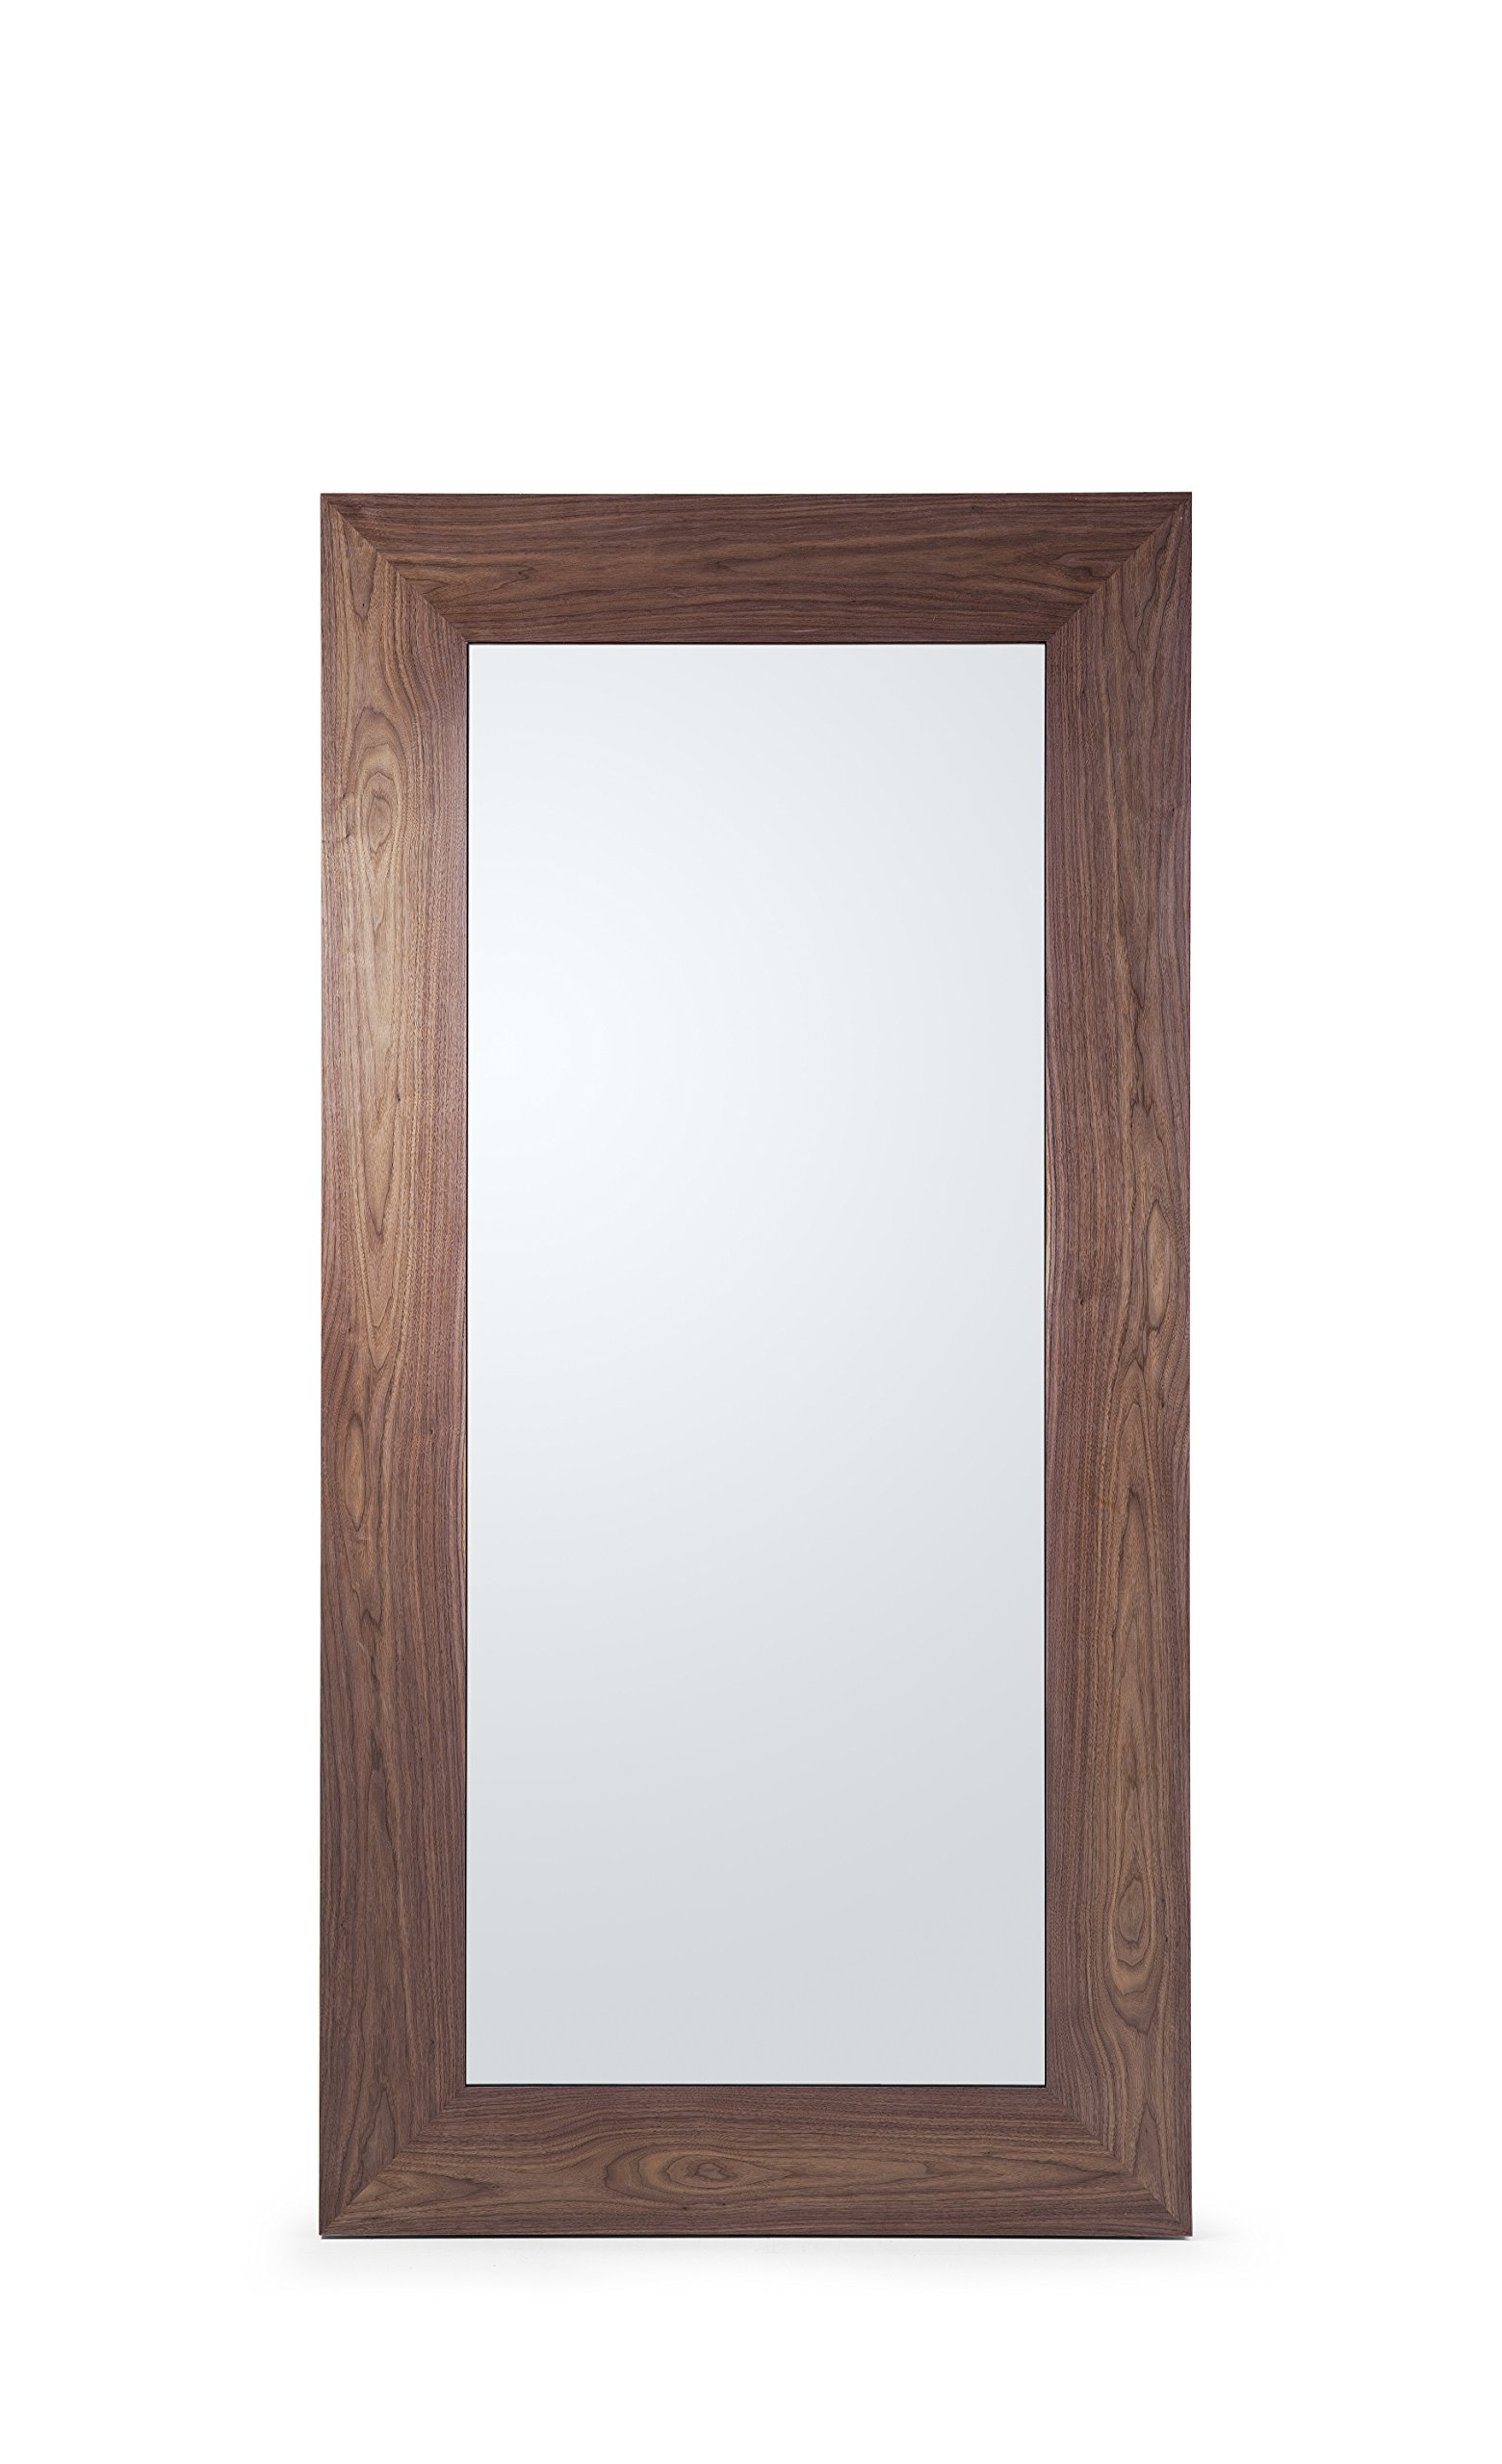 "Whiteline Furniture Fox Floor Mirror - HIGH GLOSS NATURAL WALNUT FRAME. W47"" D2"" H94"" WOOD - mirrors-bedroom-decor, bedroom-decor, bedroom - 81CuBN1OZ4L -"